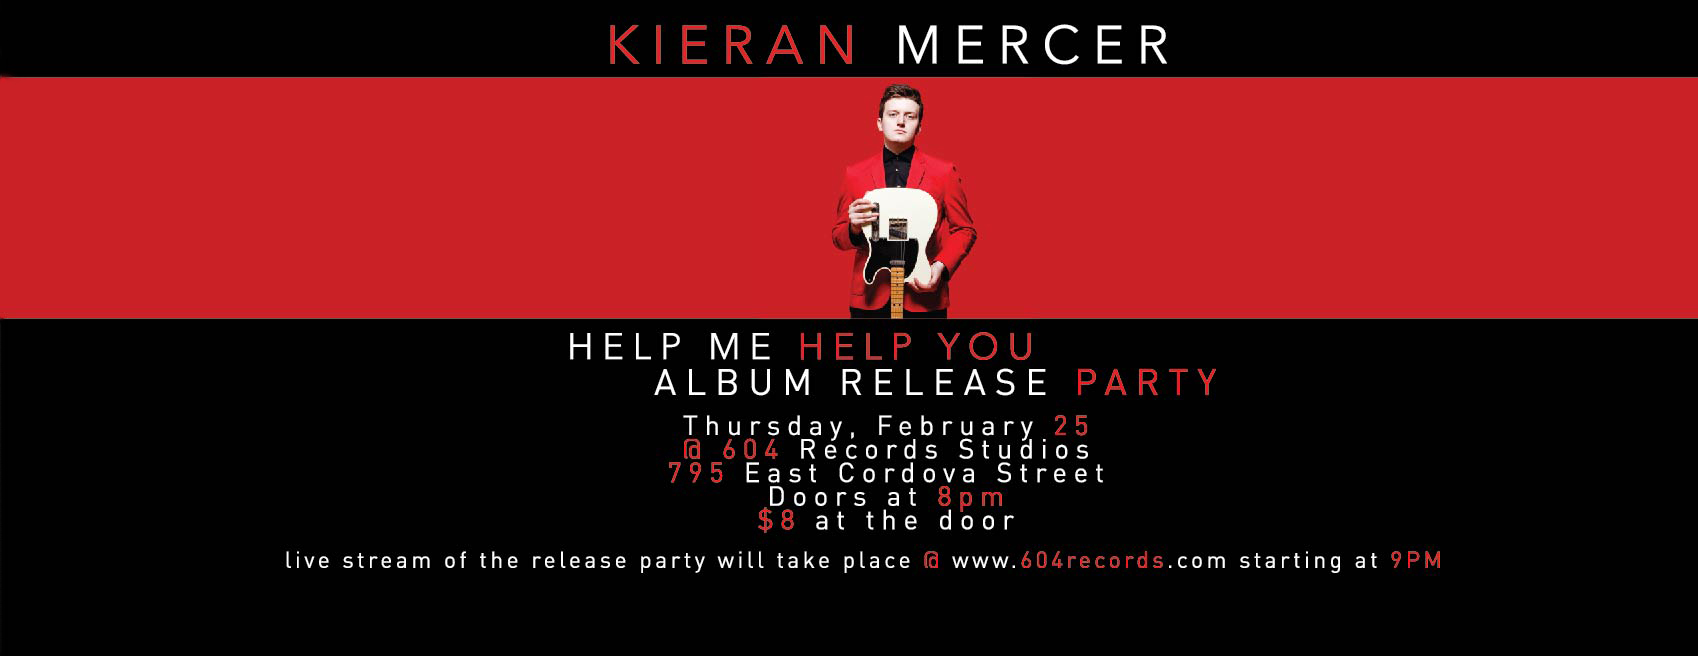 Kieran_Mercer_HelpMeHelpYou_Album_Release_Party_Poster_FB_Cover_FINAL-06.jpg